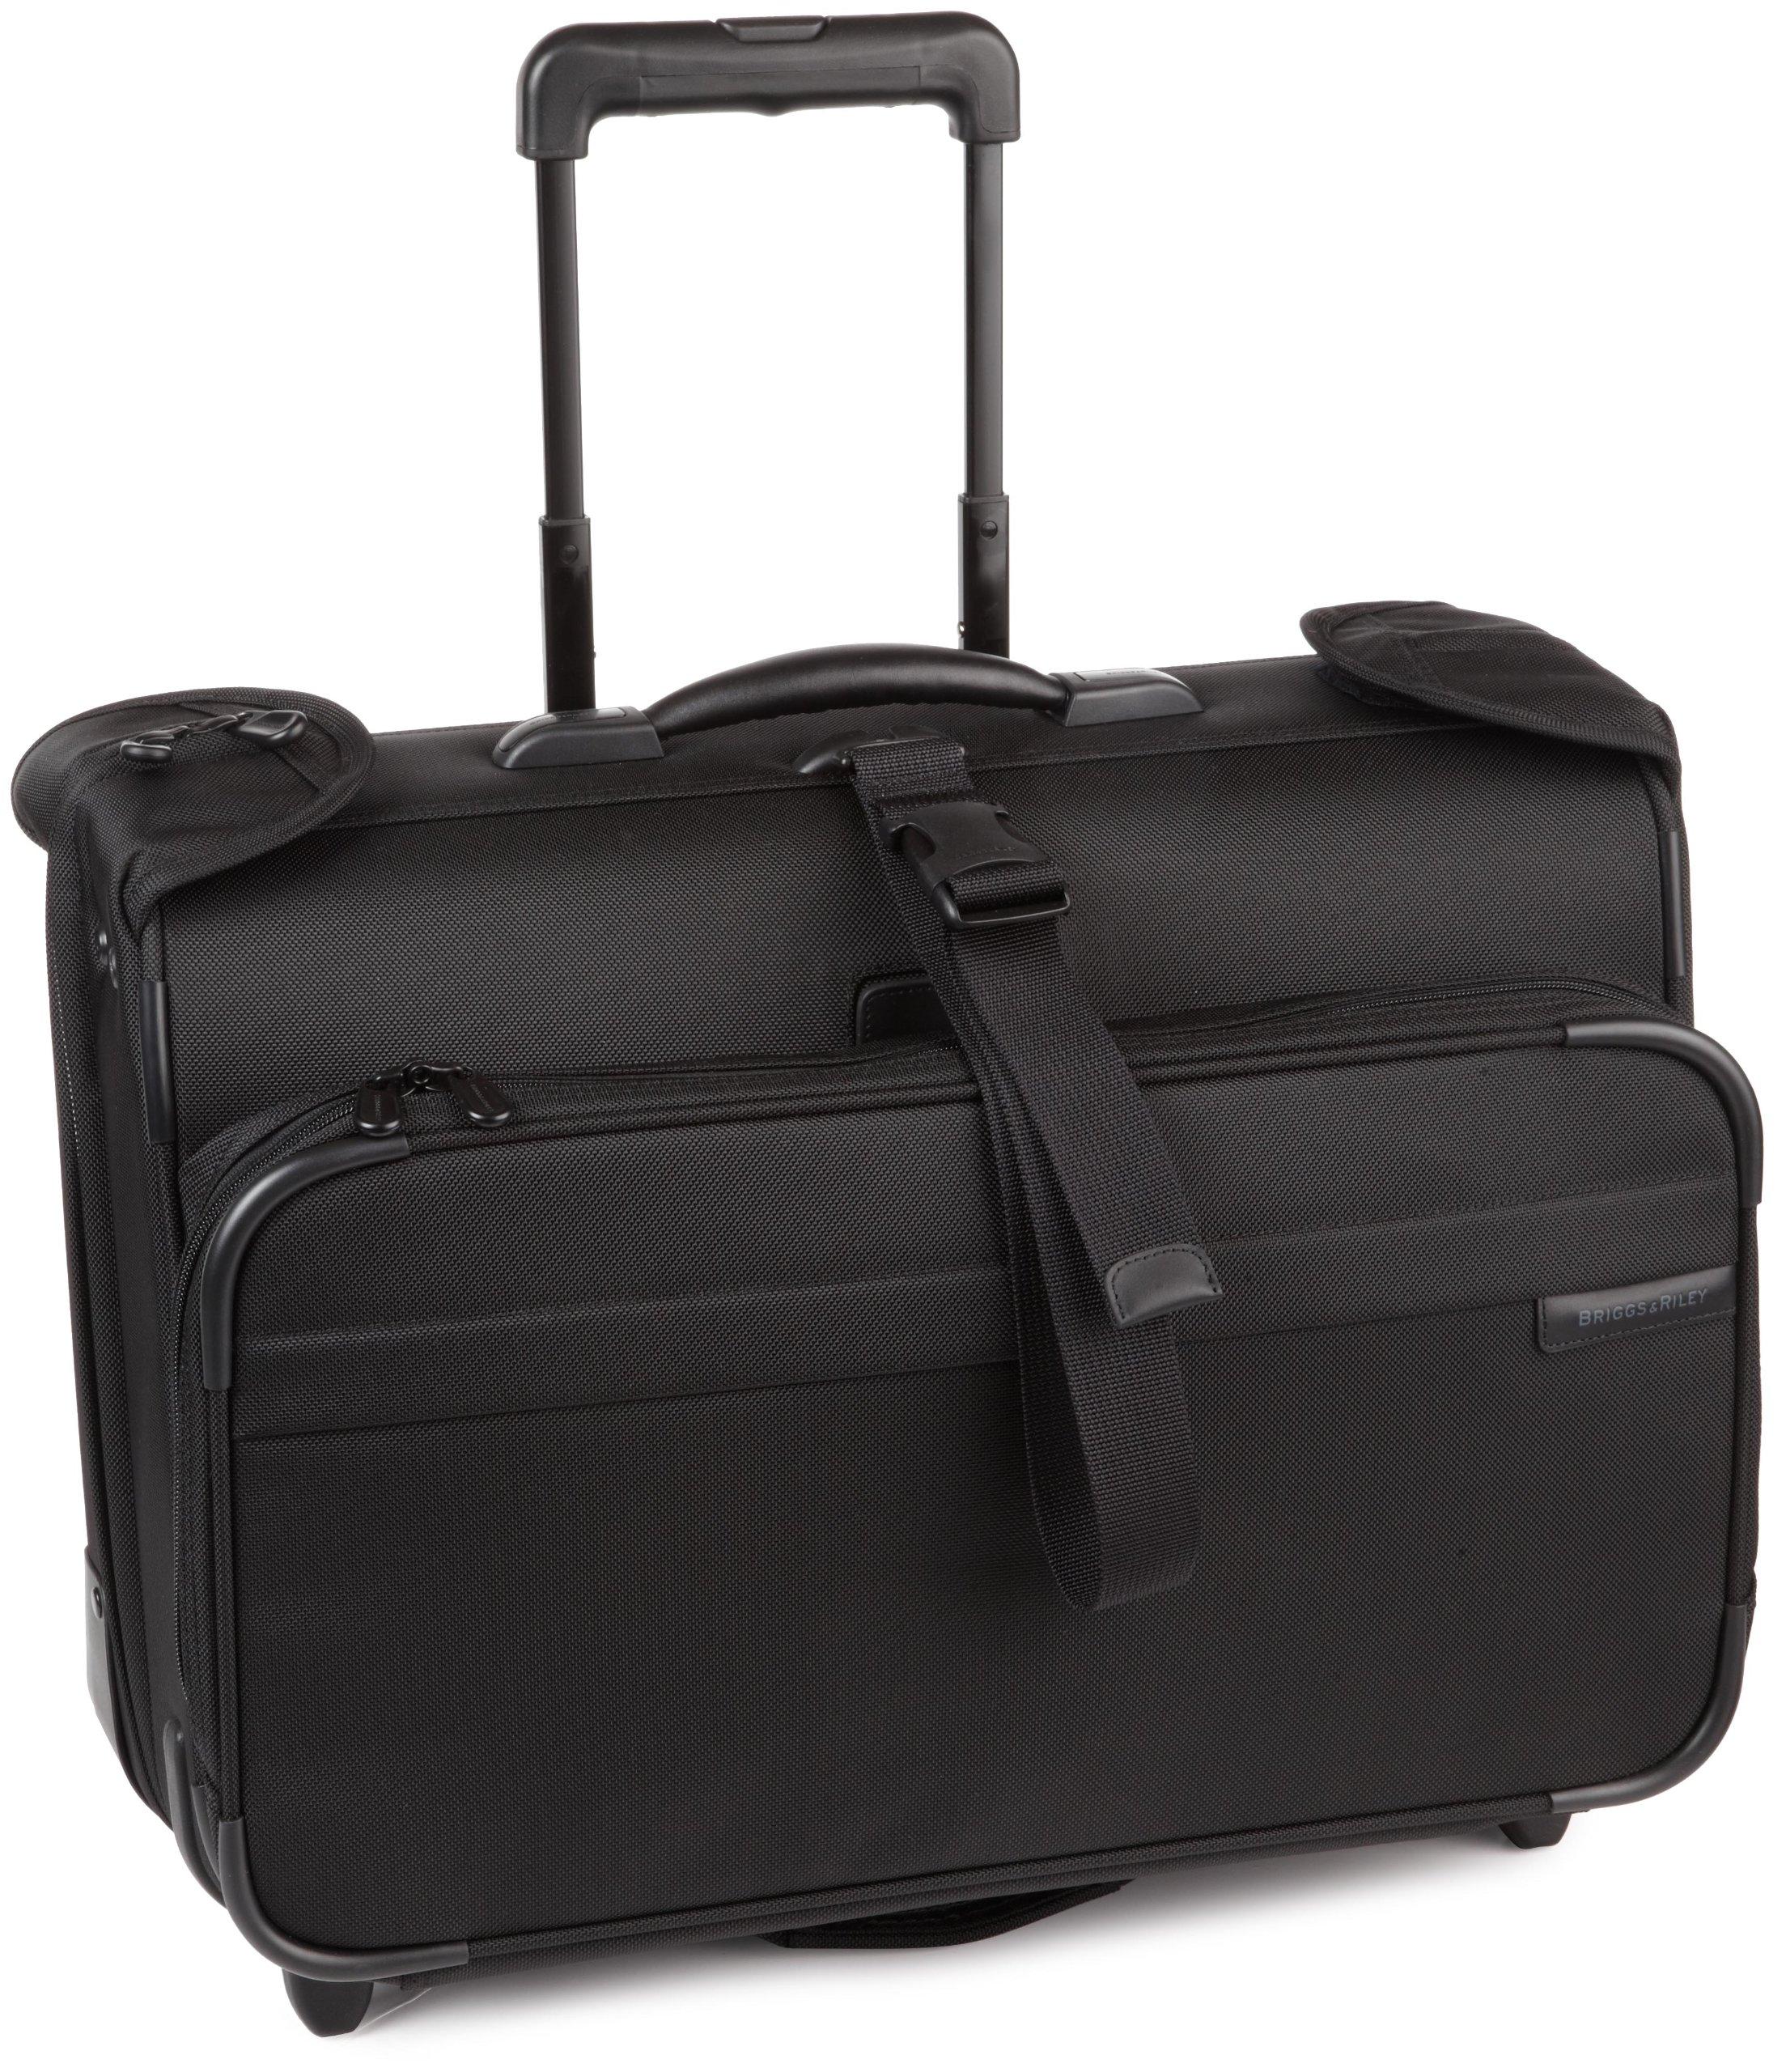 Briggs & Riley Carry-On Wheeled Garment Bag